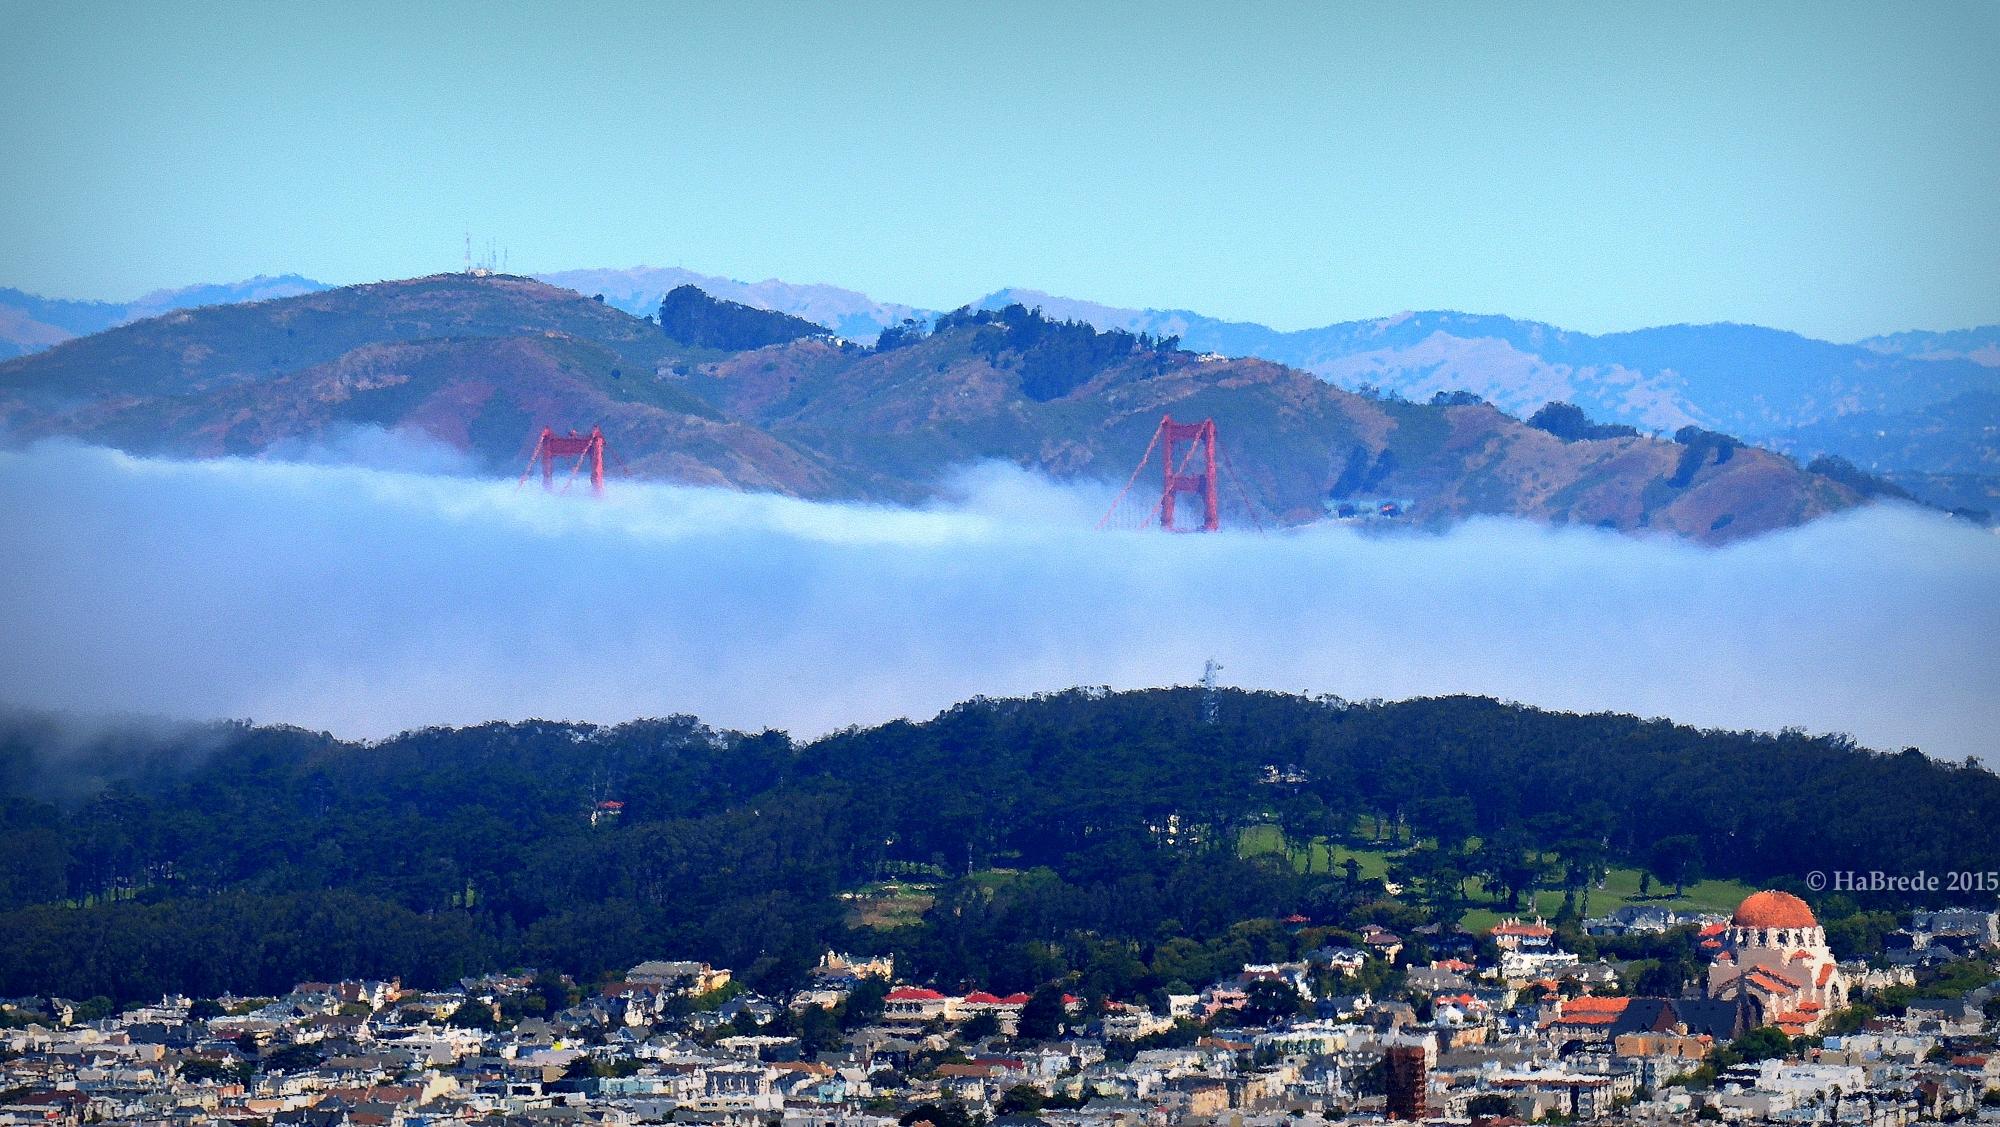 The peeks of the Golden Gate Bridge, USA